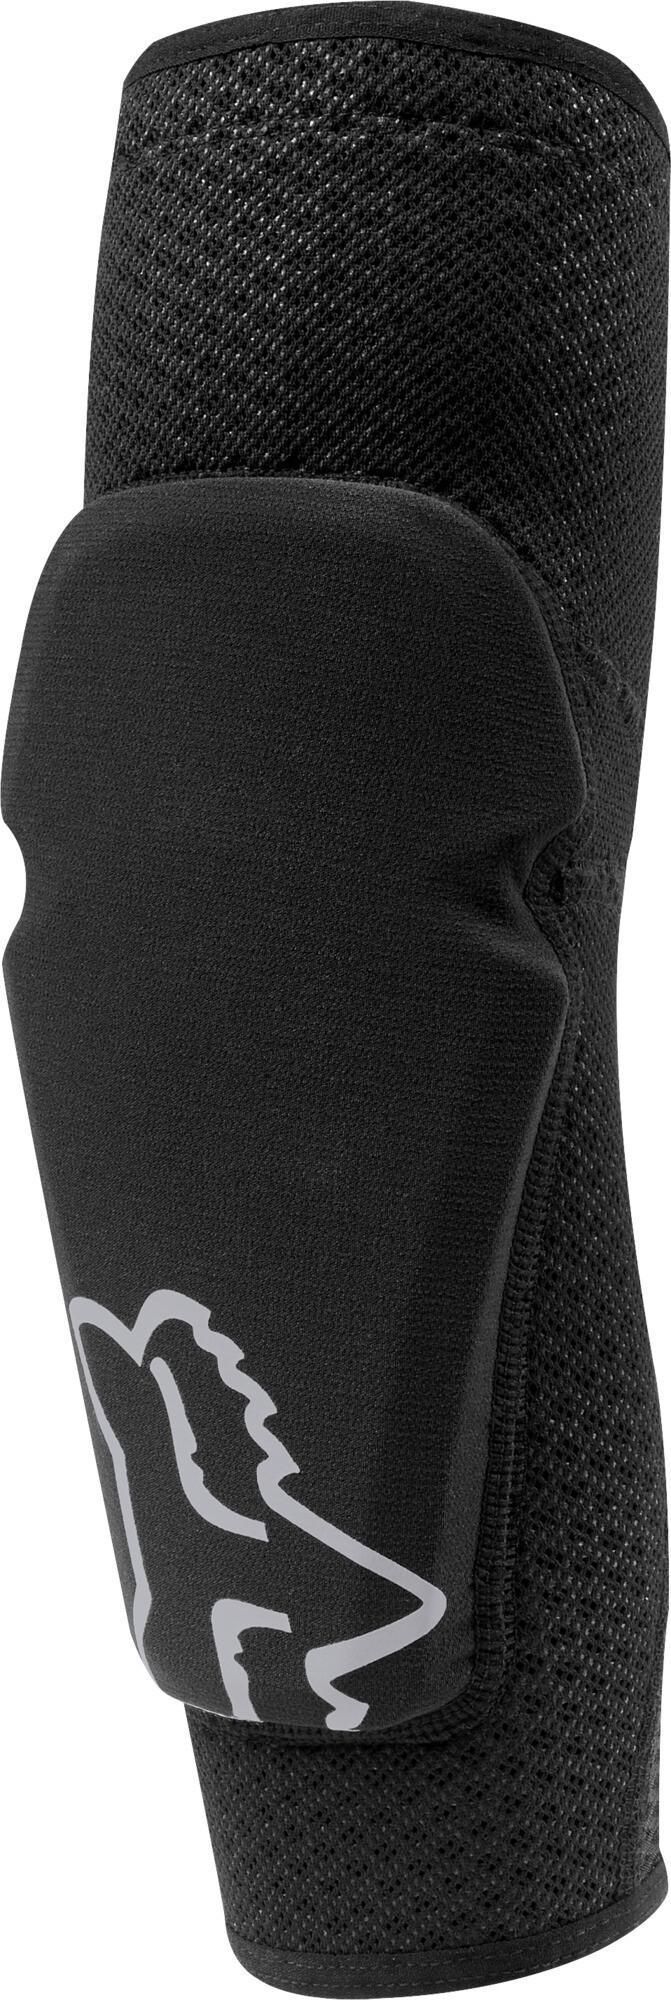 adidas FULL BODY SUIT WITH ARMS swim suit swimskin speedsuit